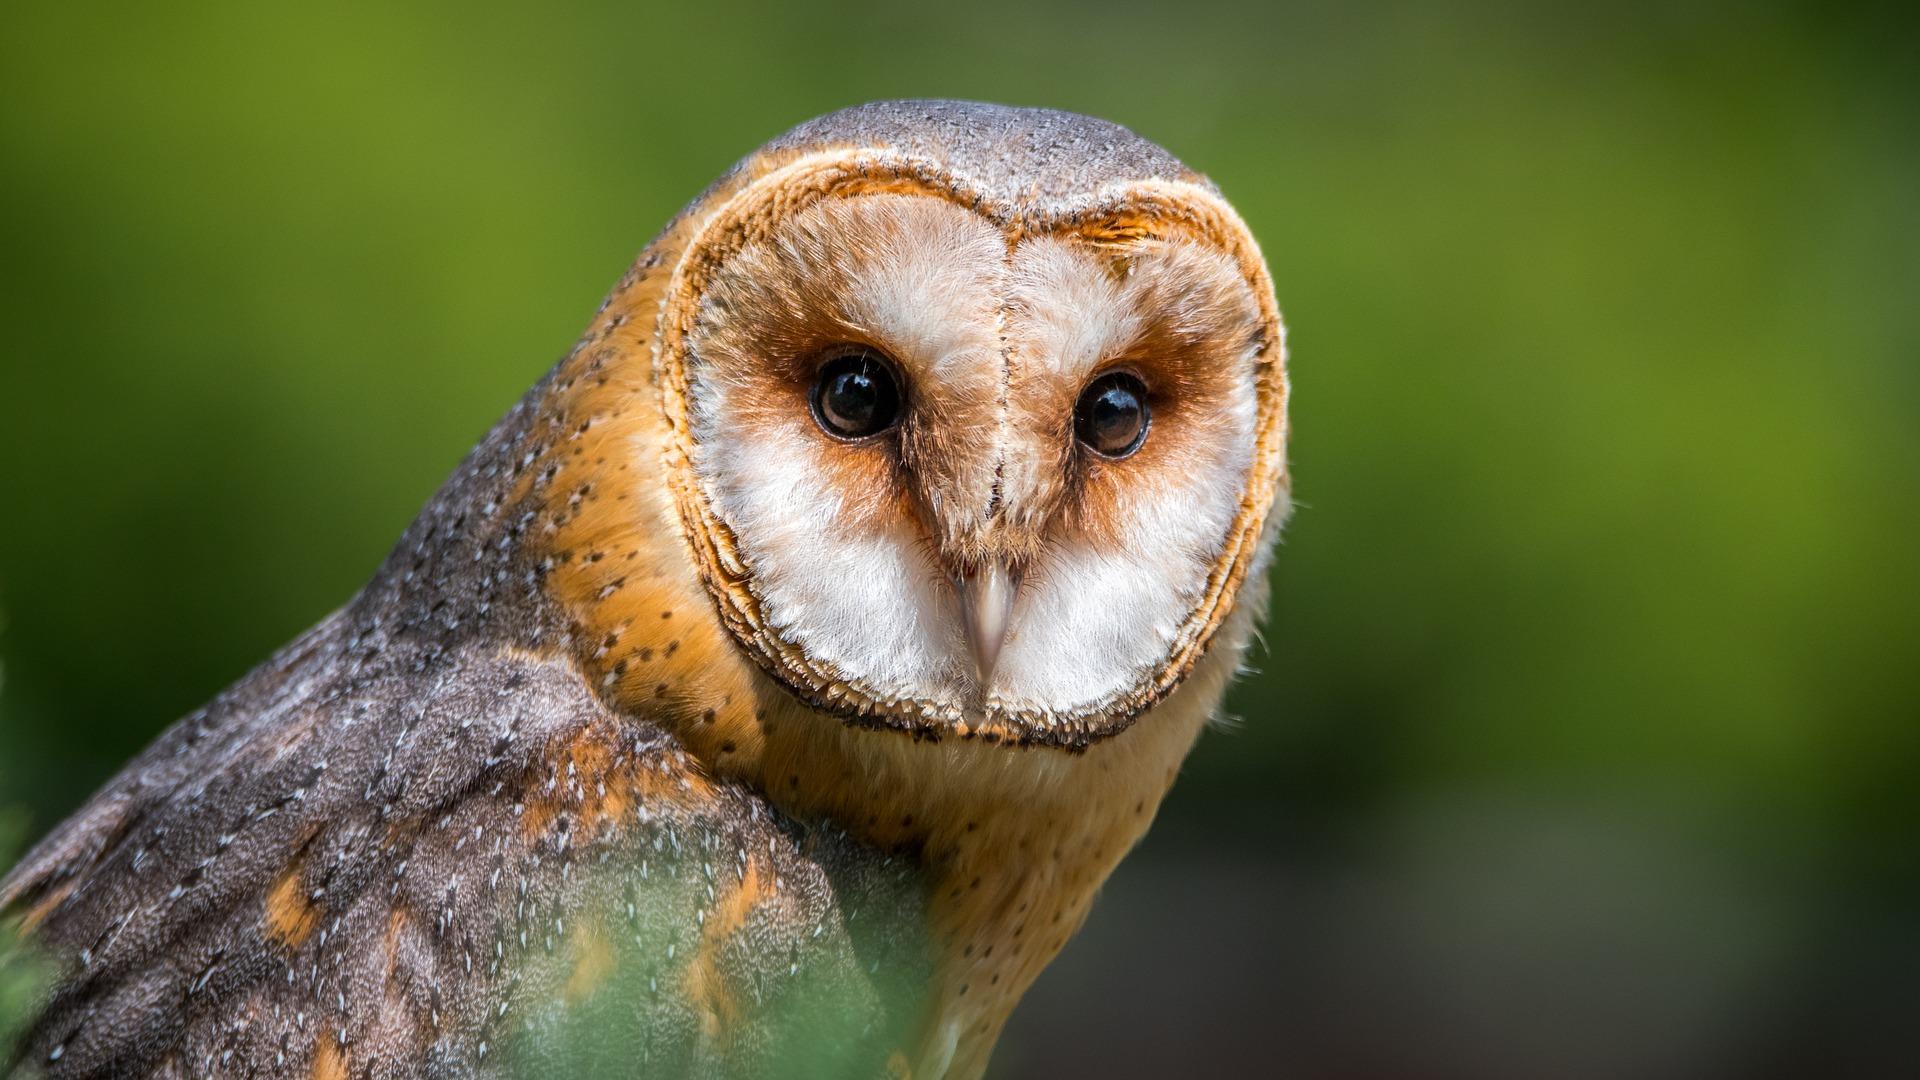 barn-owl-2550068_1920.jpg